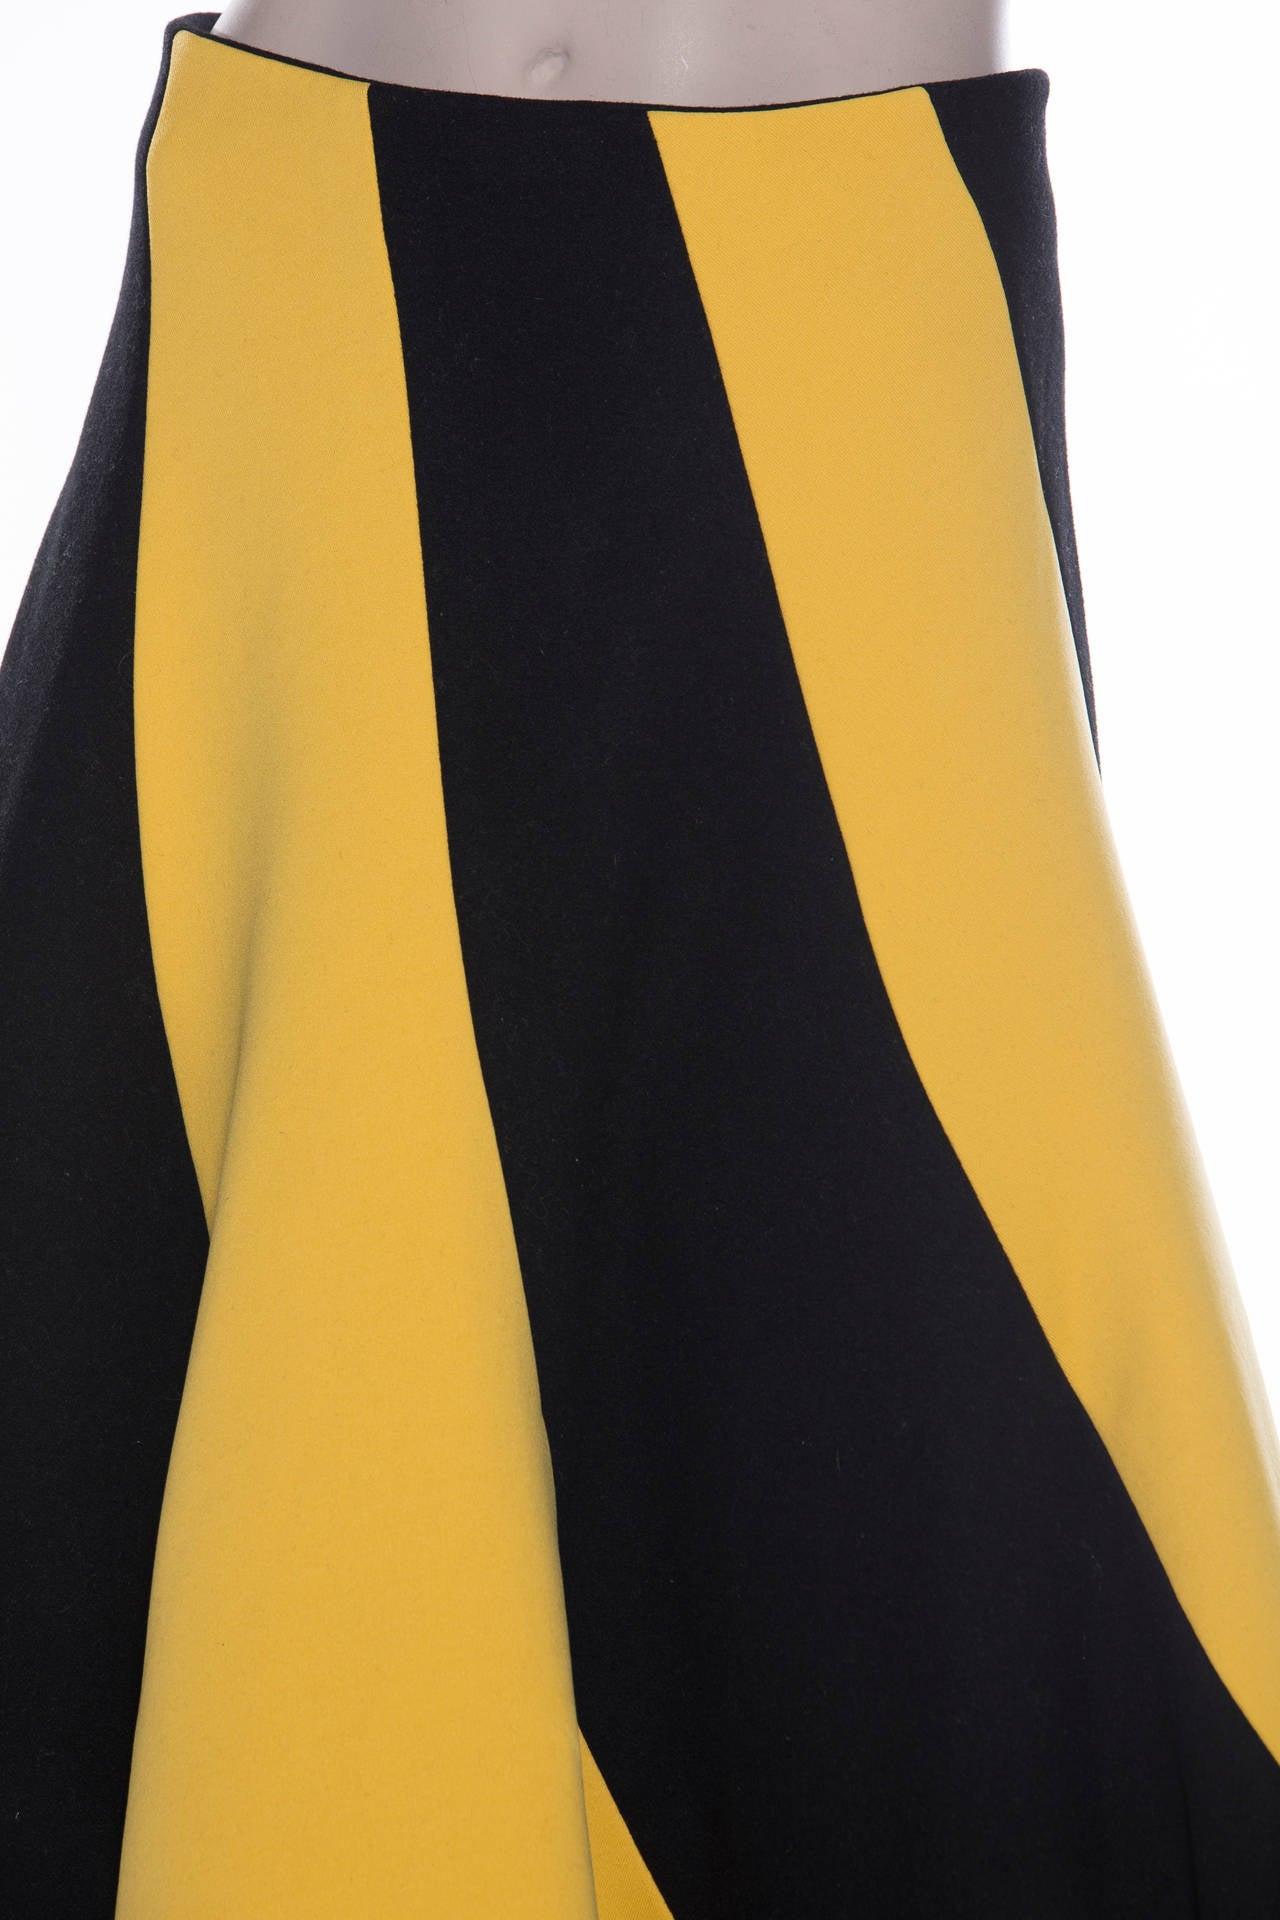 Yohji Yamamoto Circle Skirt, Circa 1990's 4